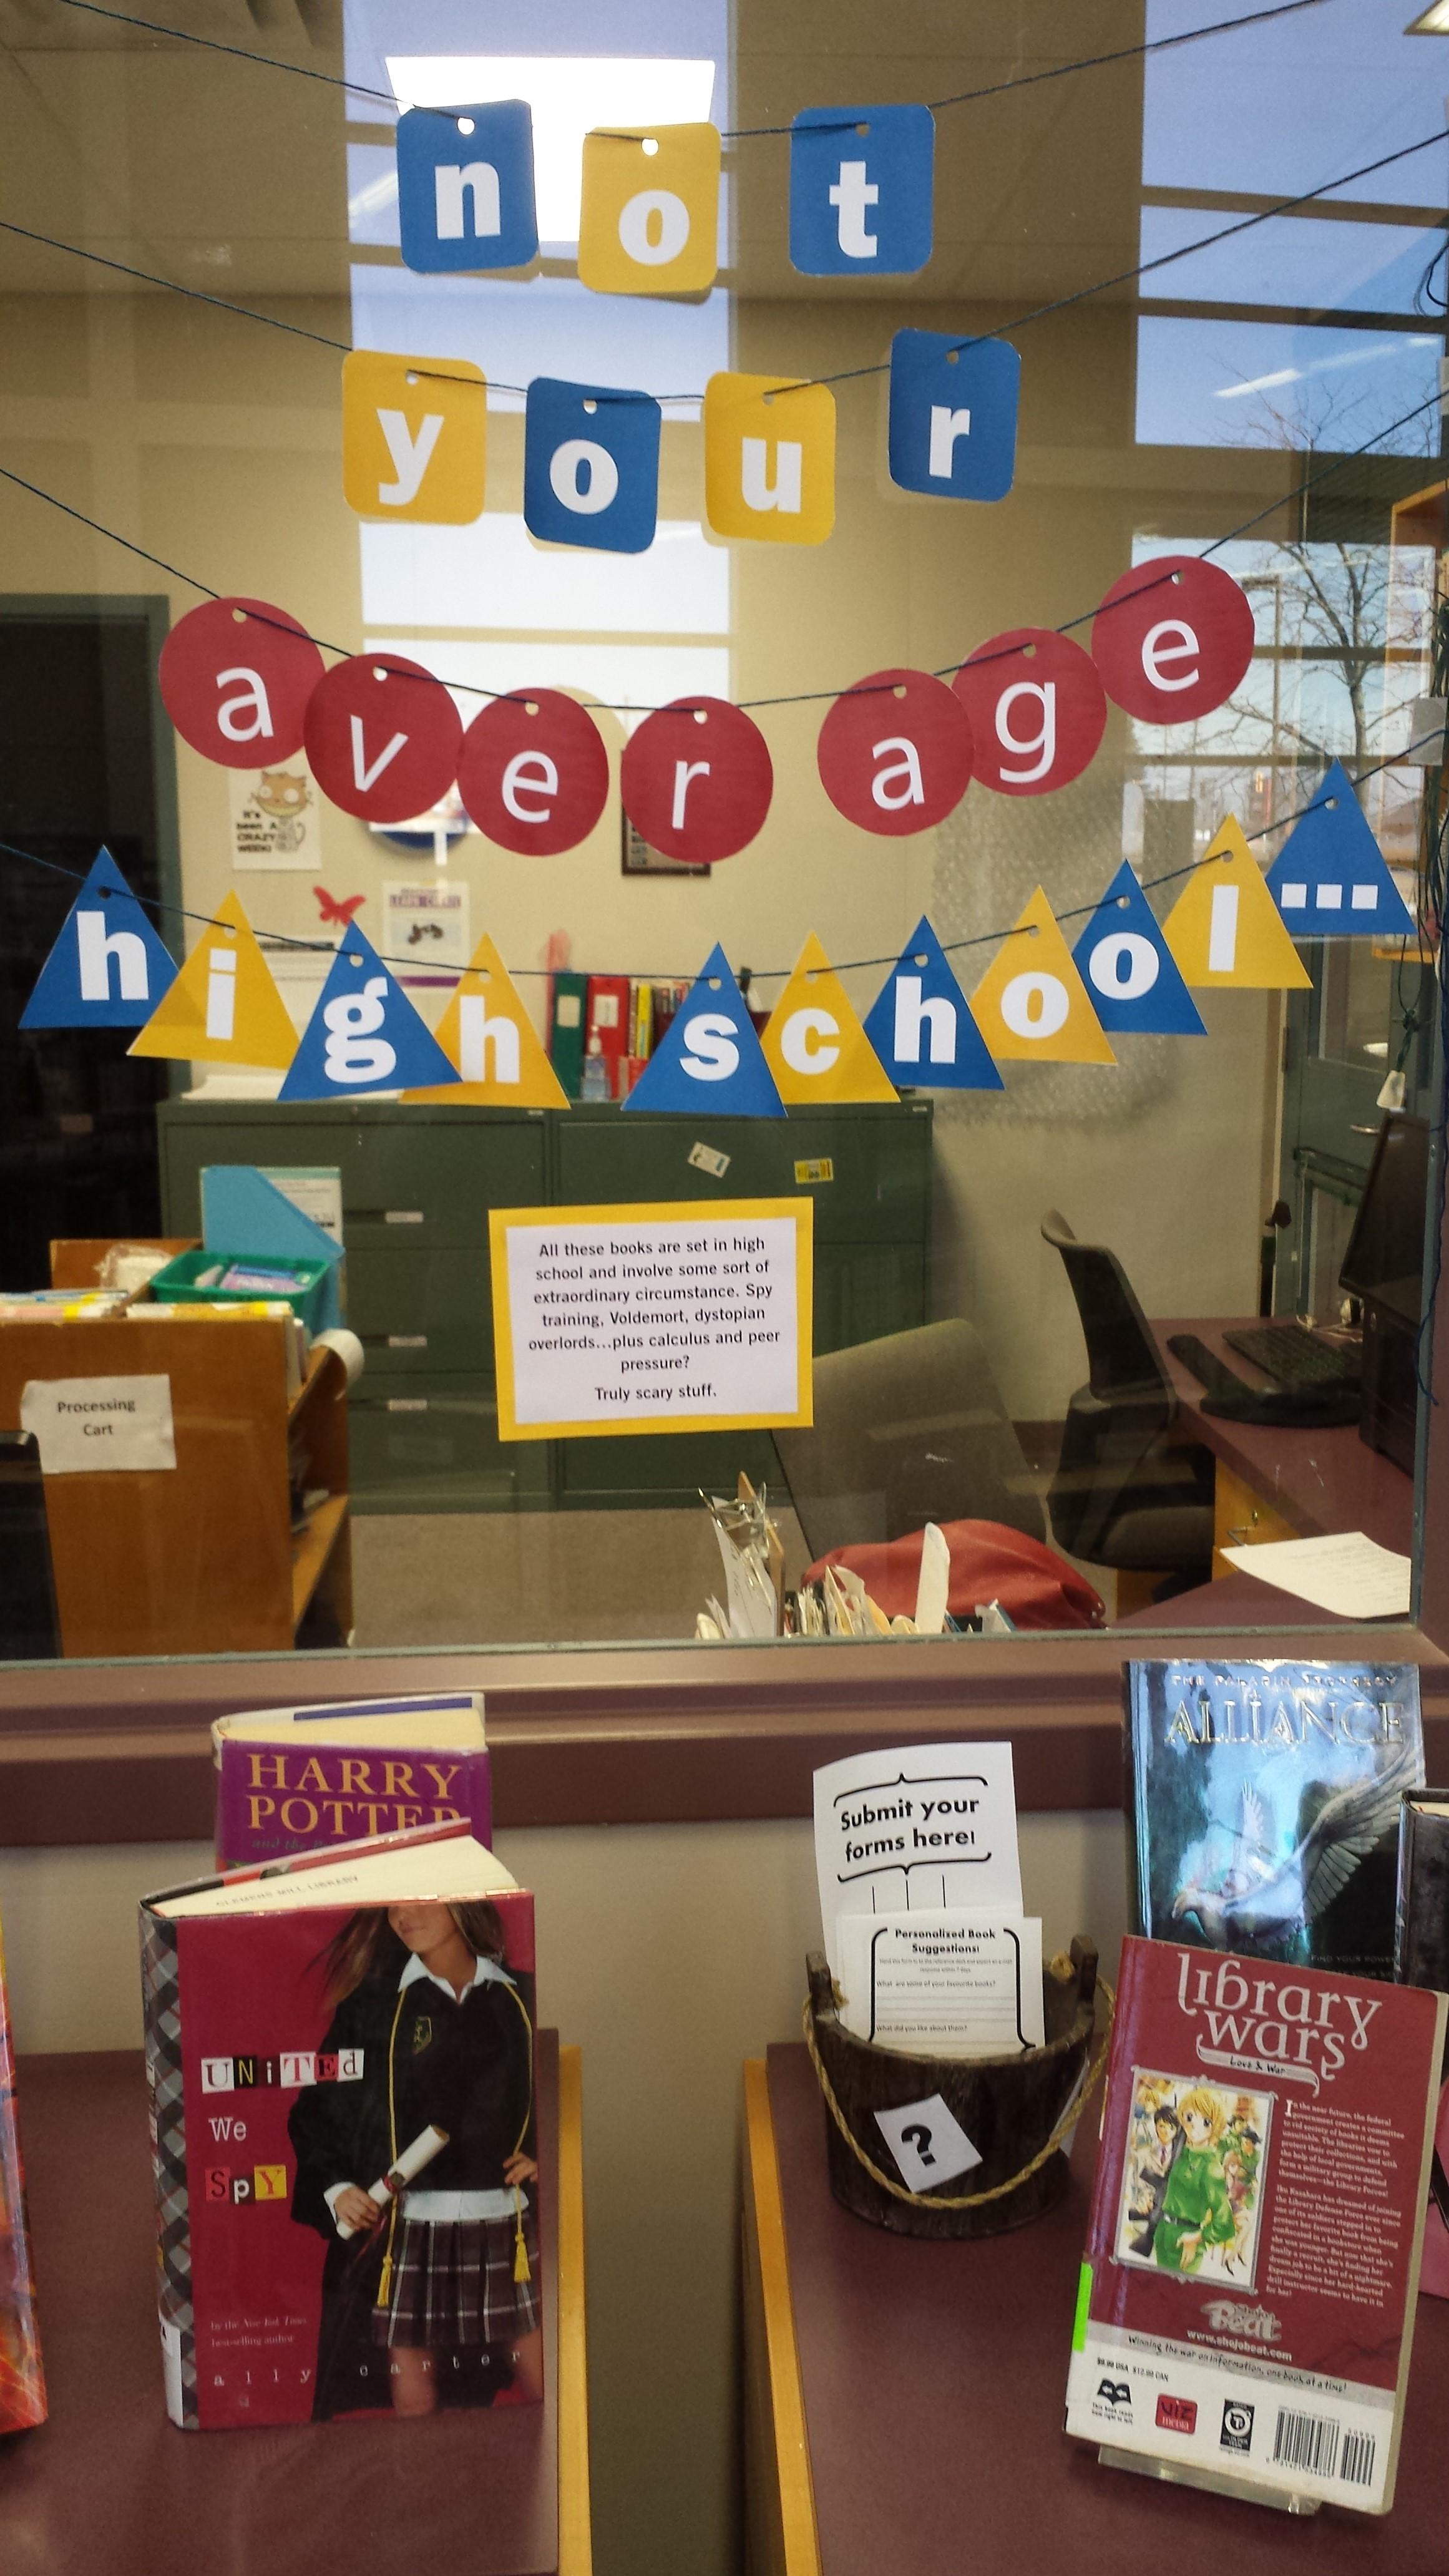 YA Display: Not Your Average Highschool – Ontarian Librarian